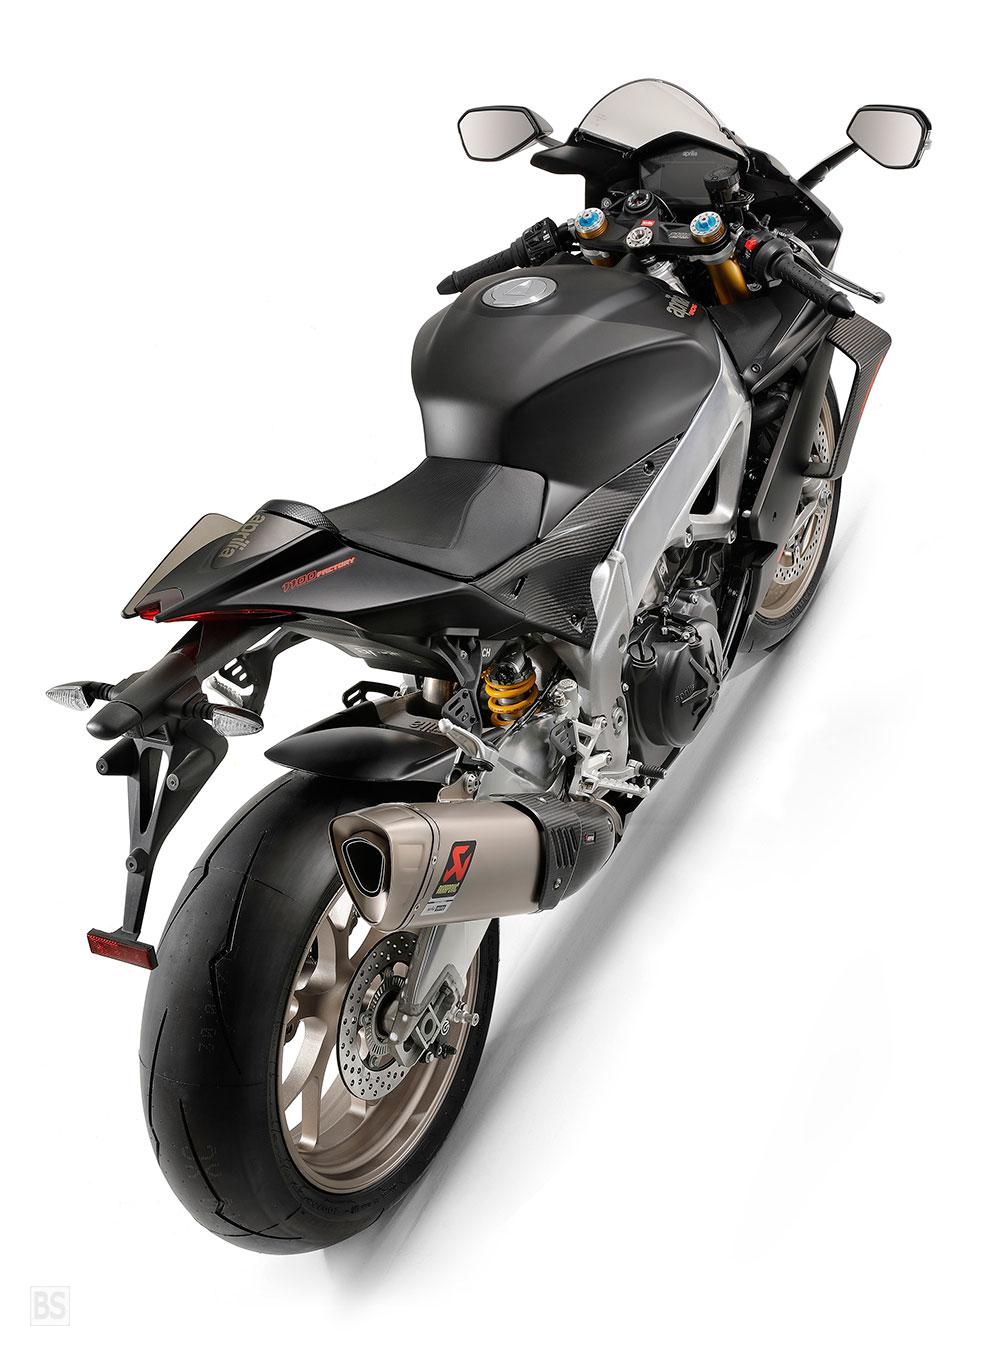 0e696bbf2a Aprilia RSV4 1100 Factory - Παρουσίαση - Φωτογραφίες - Biker Spirit ...